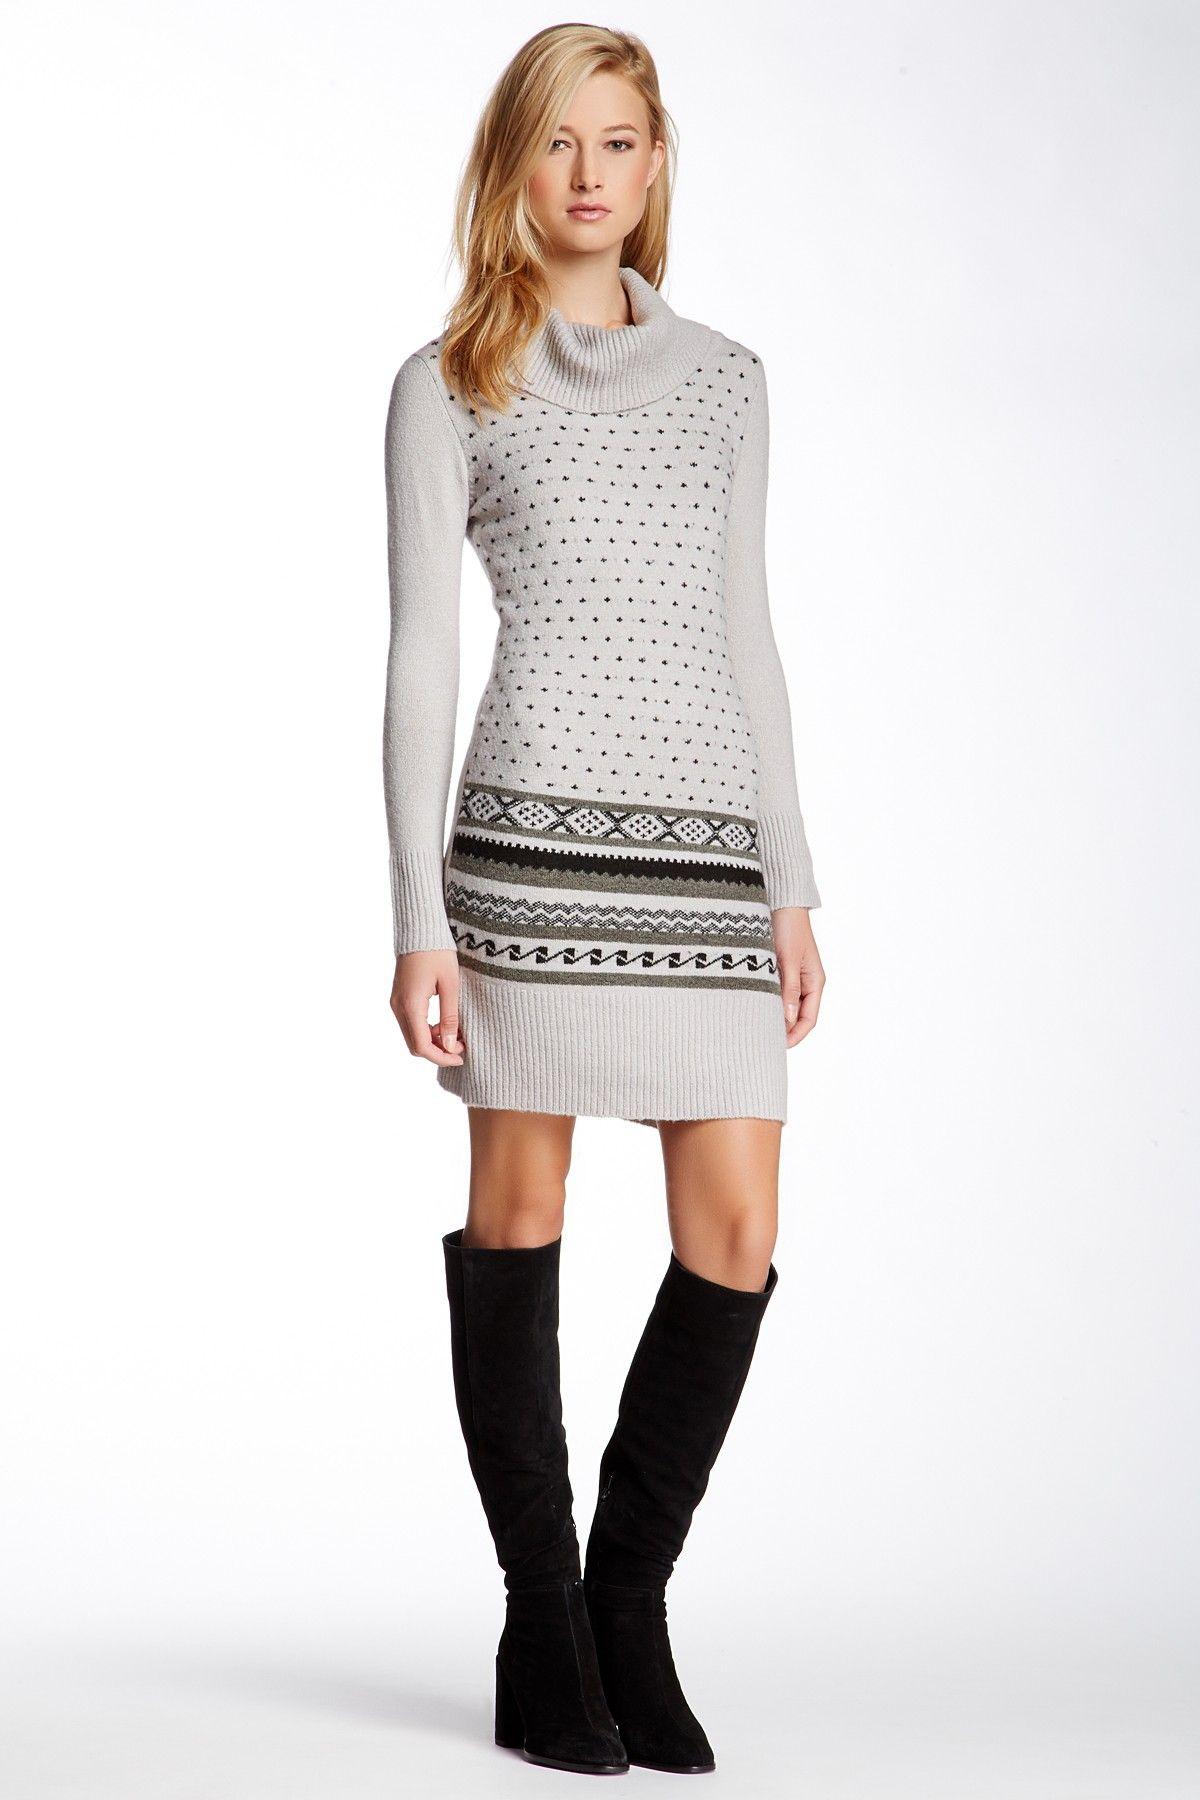 Vertigo | Long Sleeve Cowl Neck Sweater Dress | Cowl neck